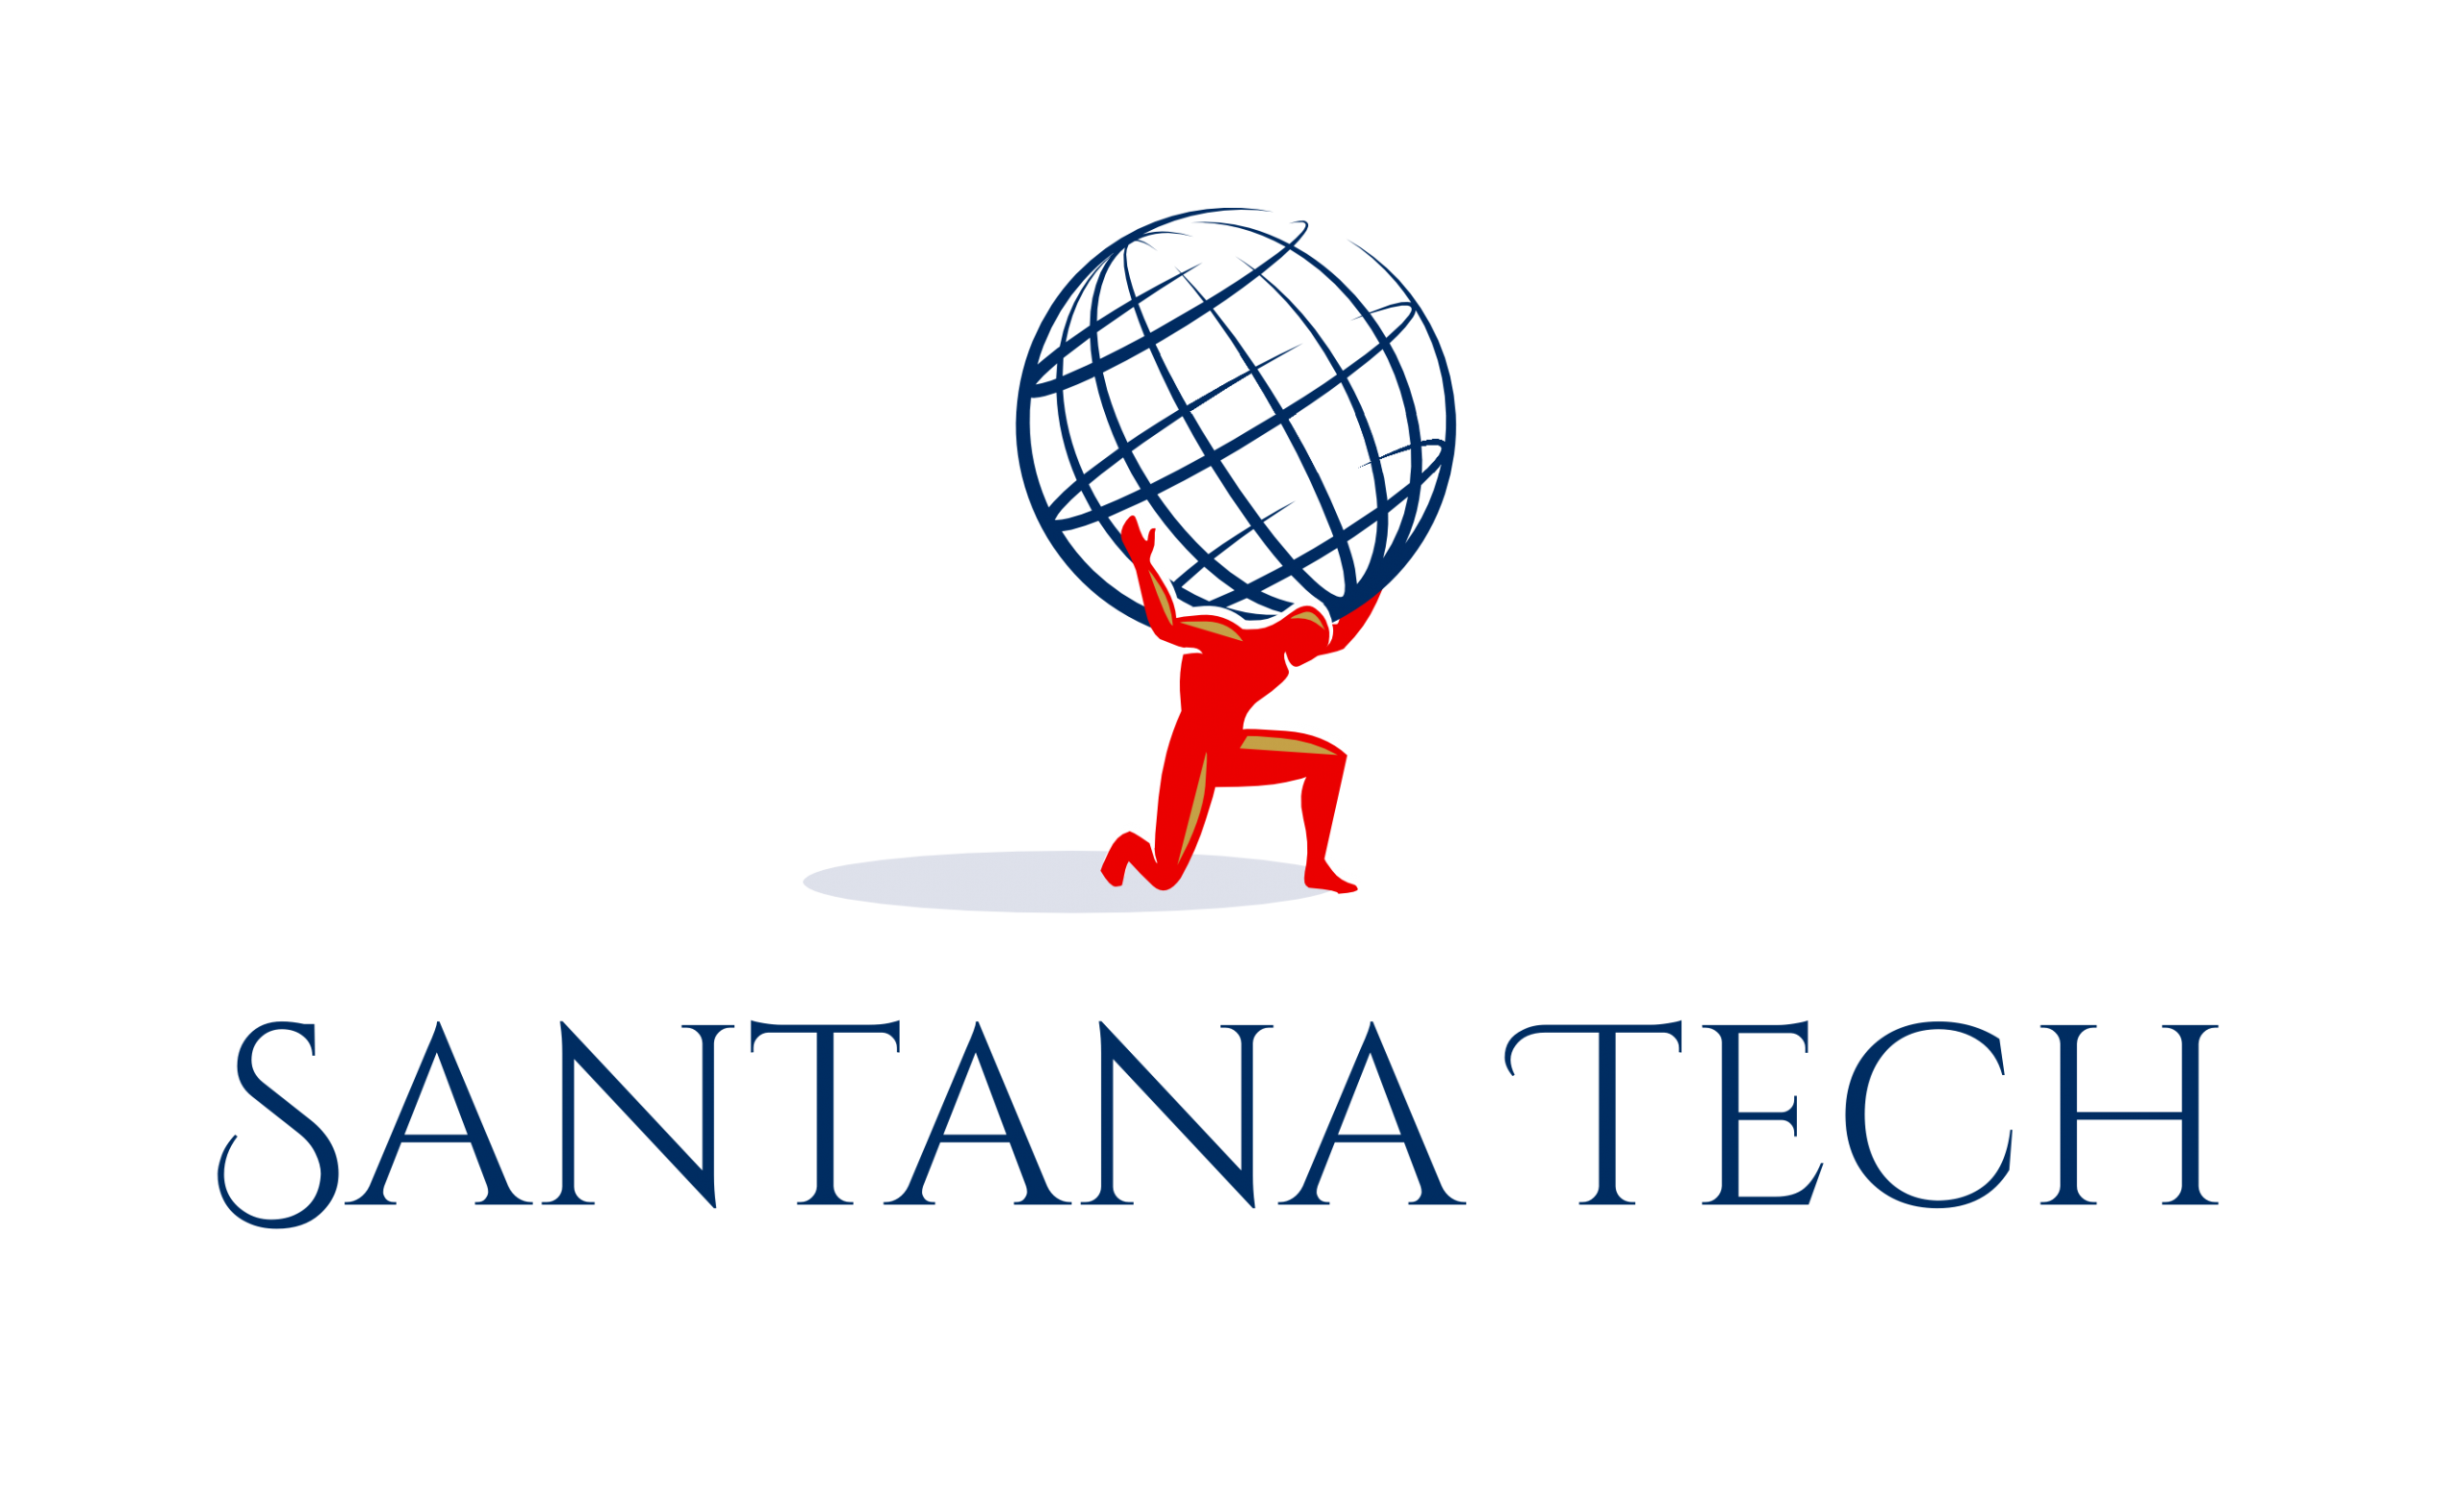 Santana Tech LLC